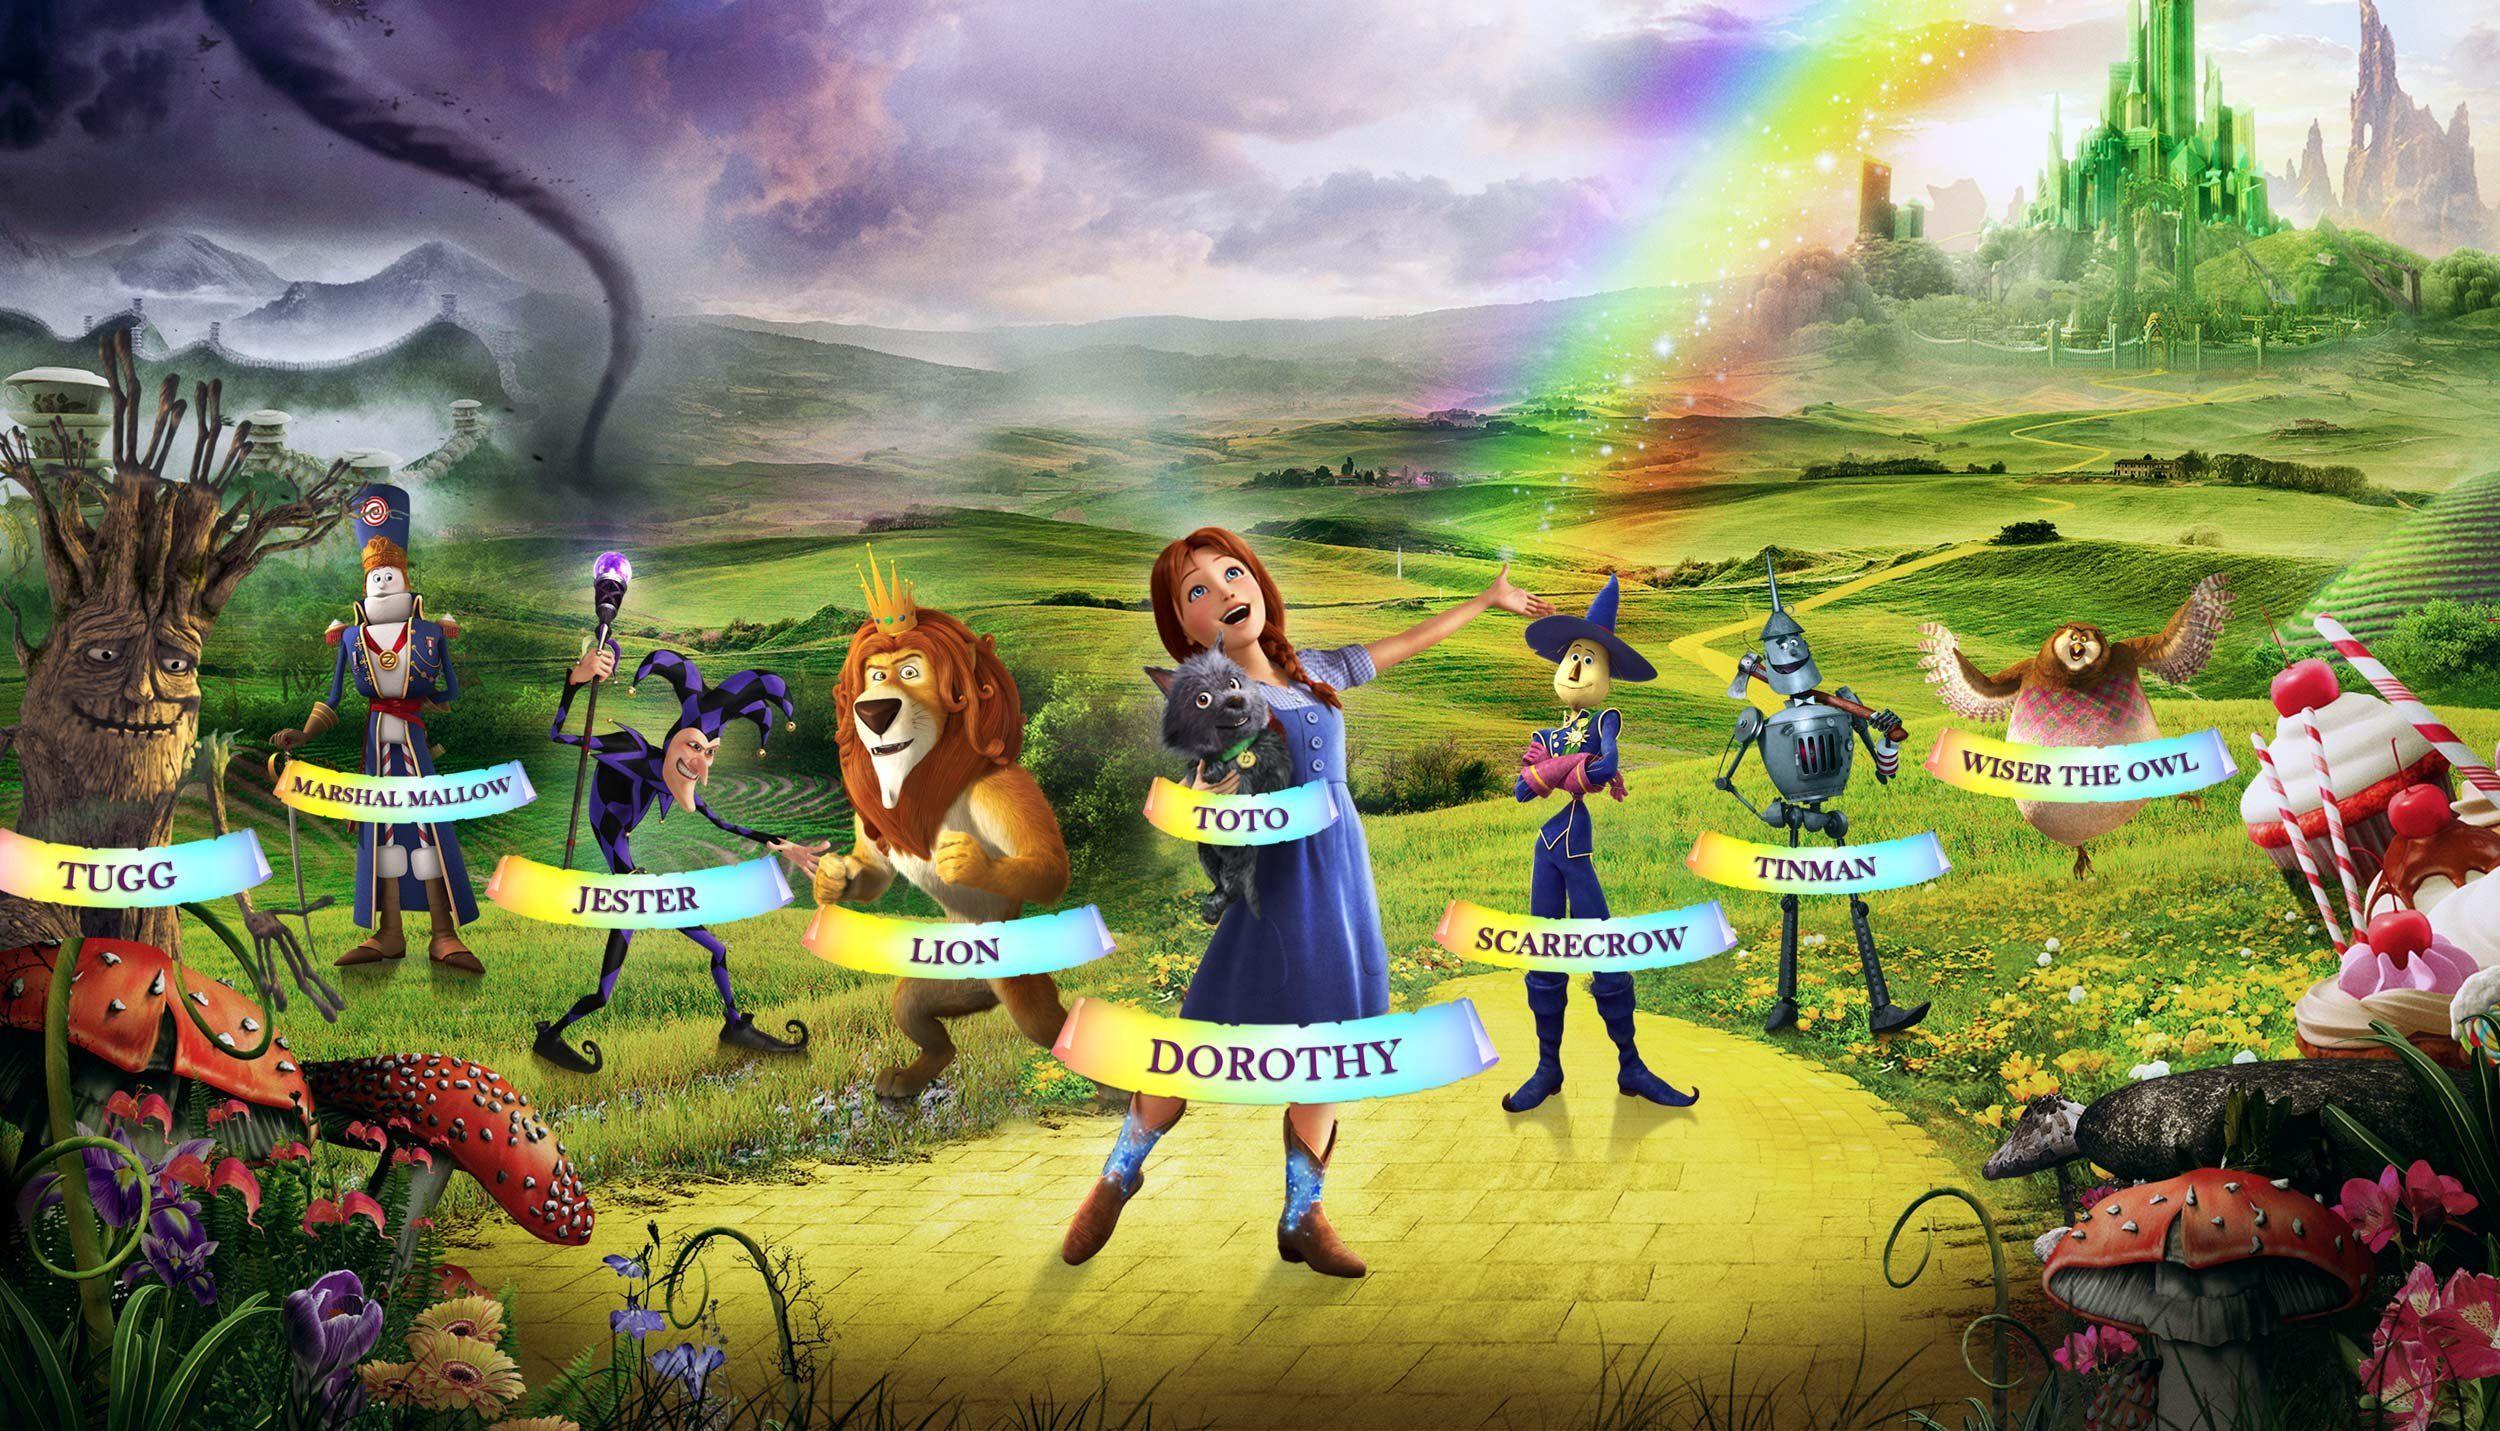 Wizard Of Oz Wallpaper Border Hd Wallpapers